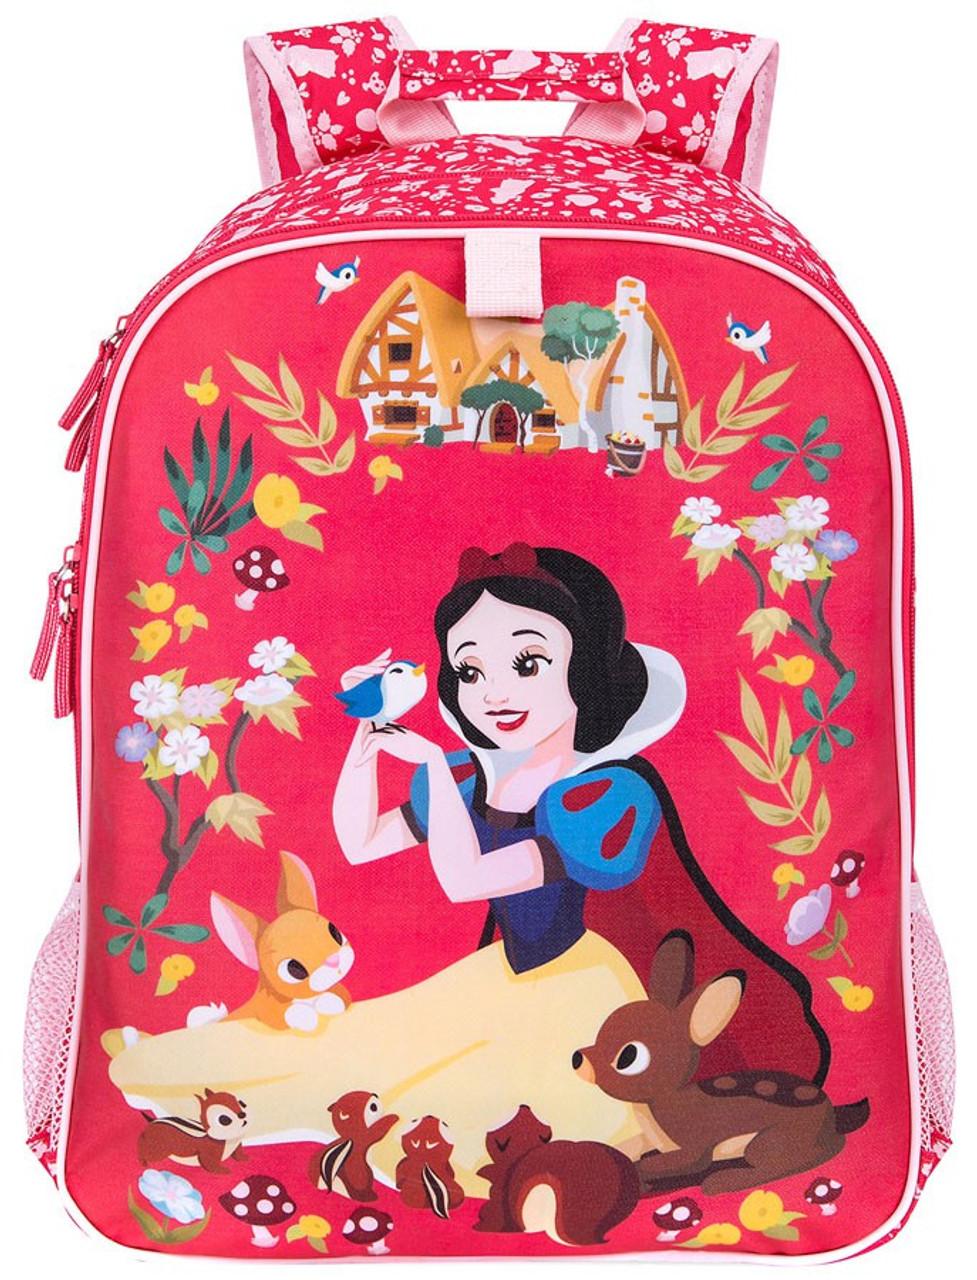 Disney Princess Snow White Snow White Exclusive Backpack - ToyWiz